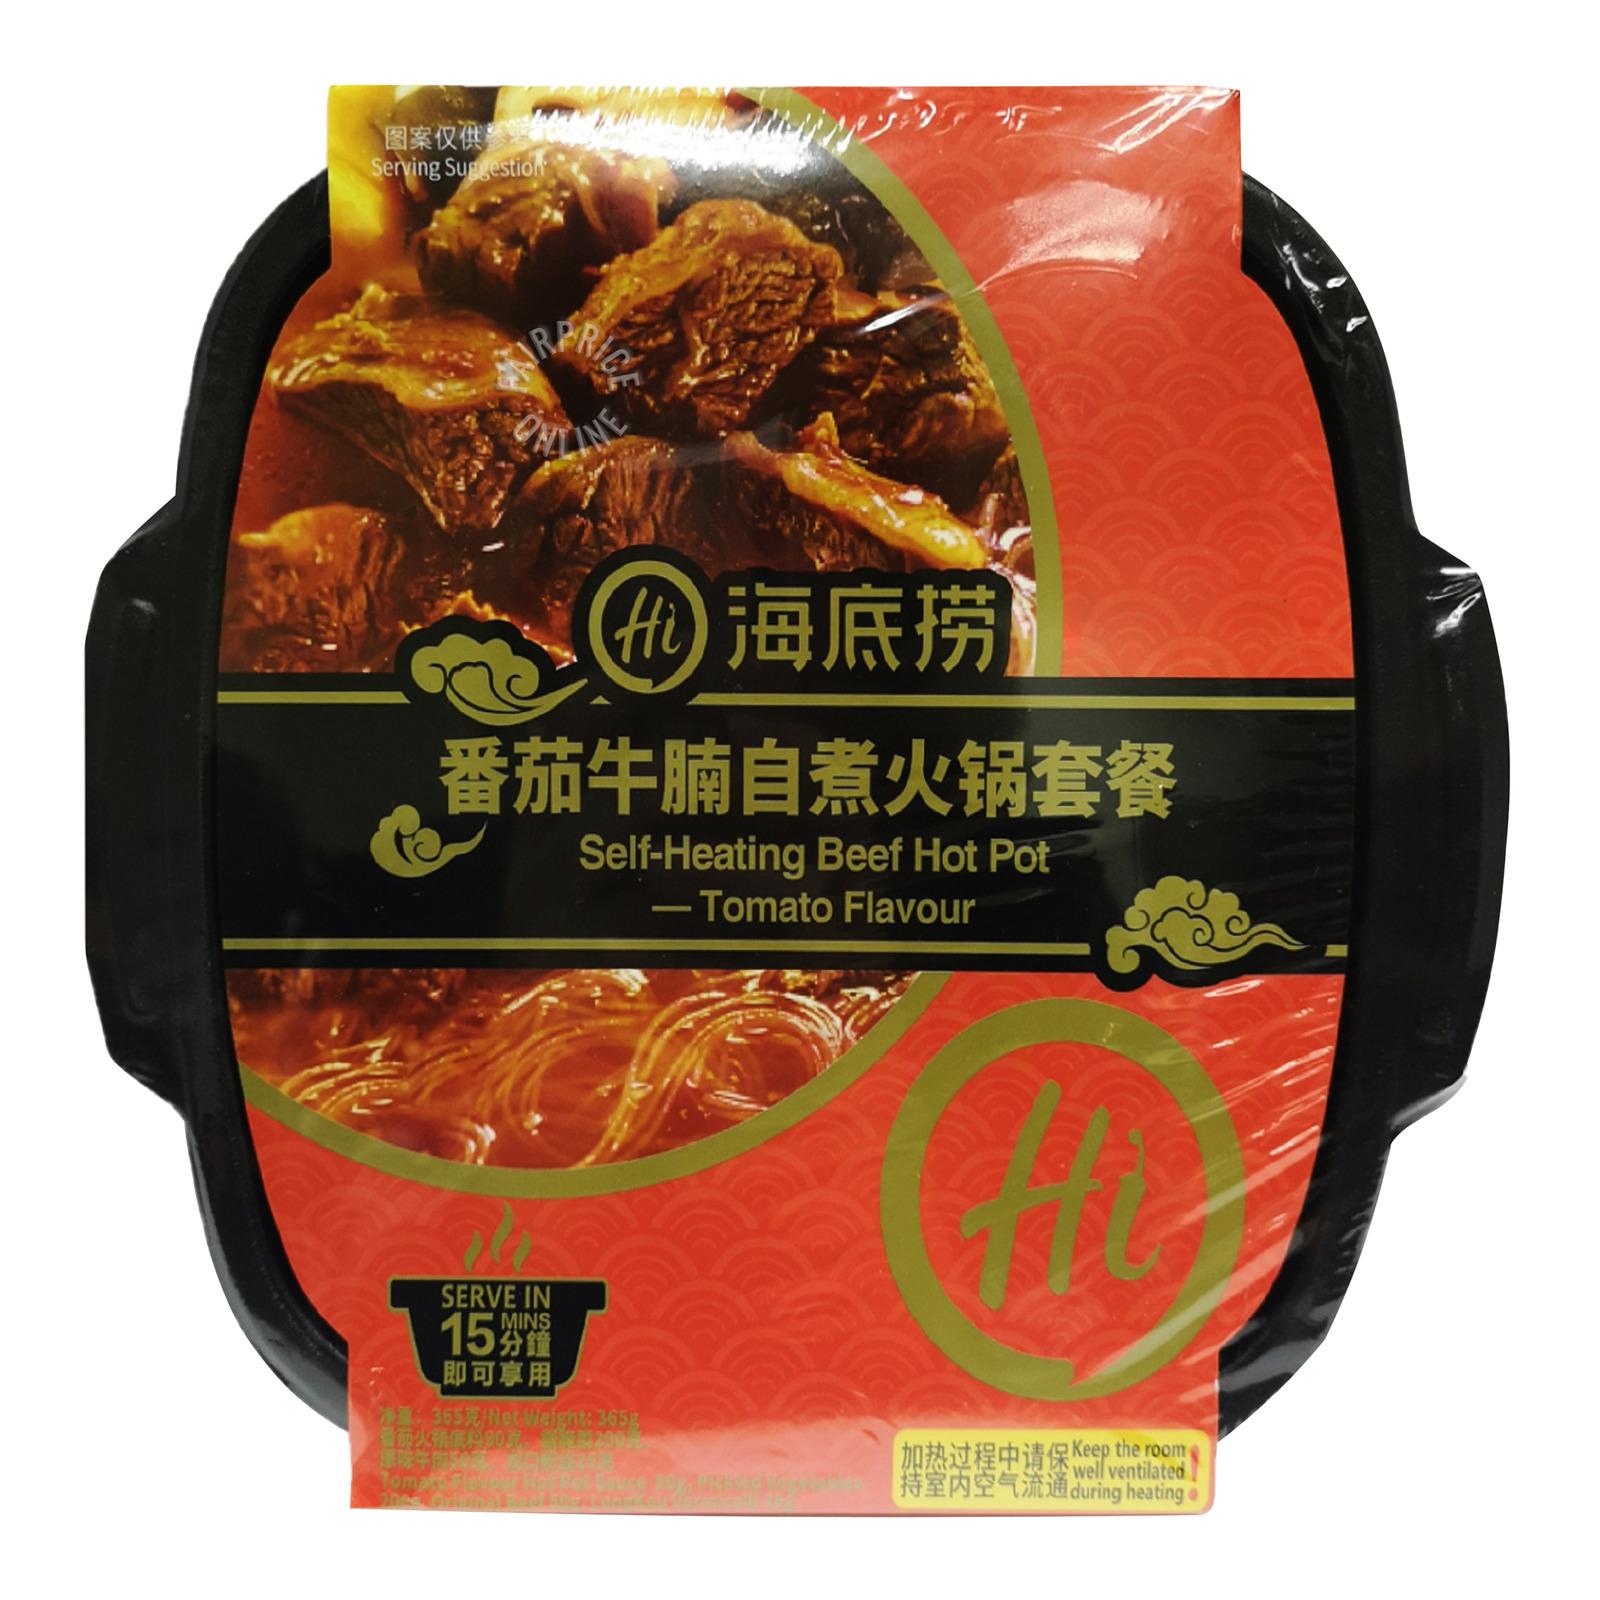 Hai Di Lao Self-Heating Beef Hot Pot - Tomato